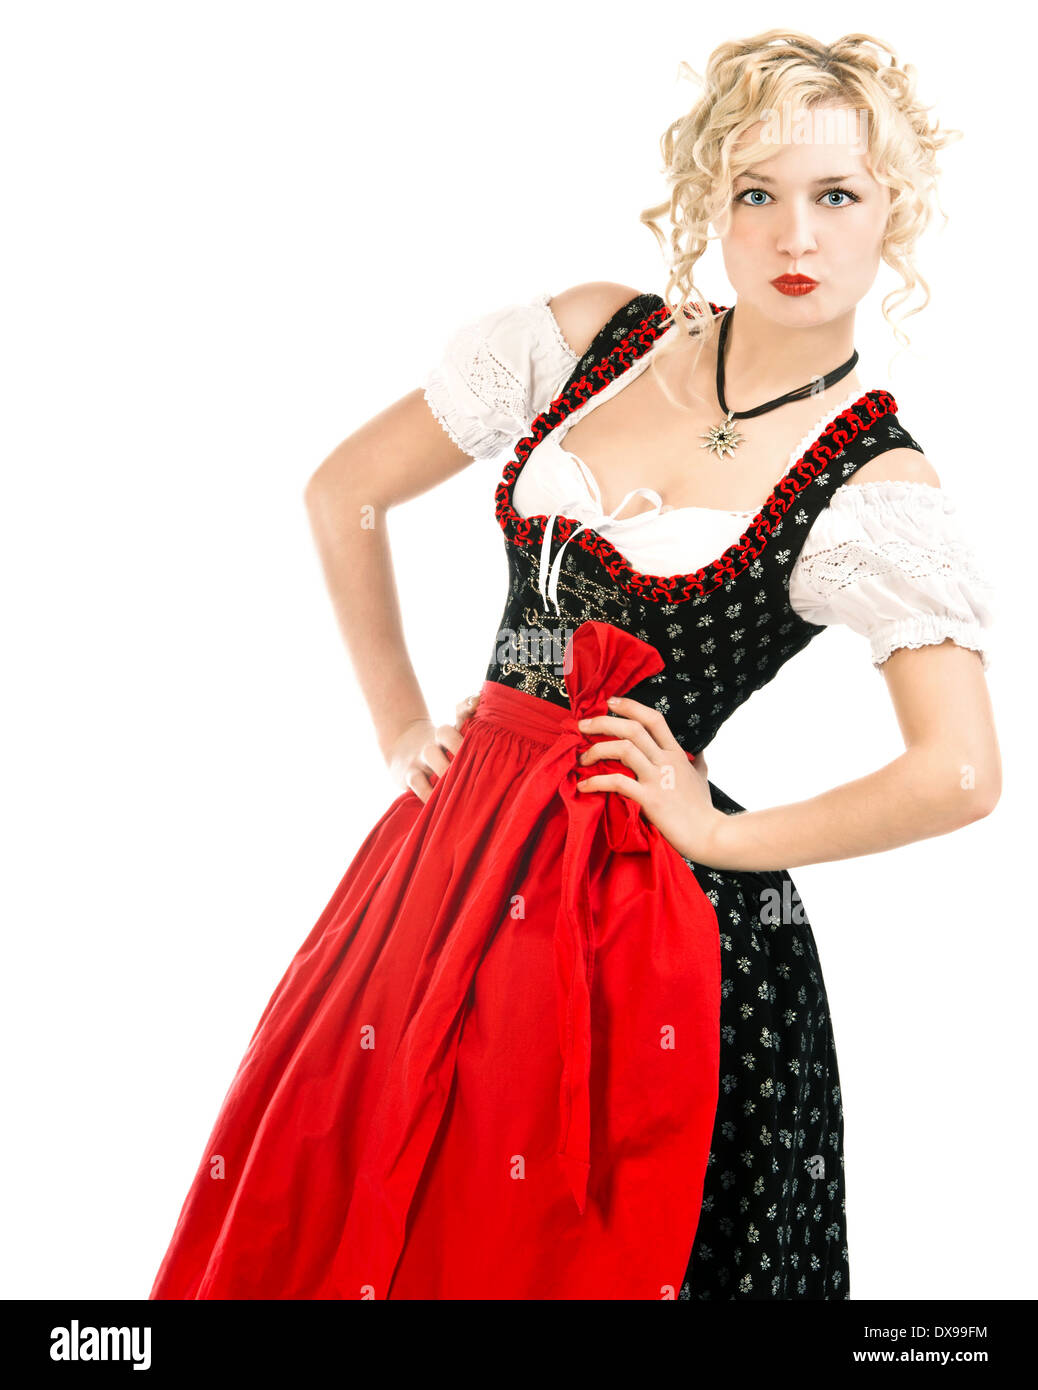 Femme Typiquement Dirndl Blanc Robe Sur Fond Bavarois En Allemande ppxqtrwF4